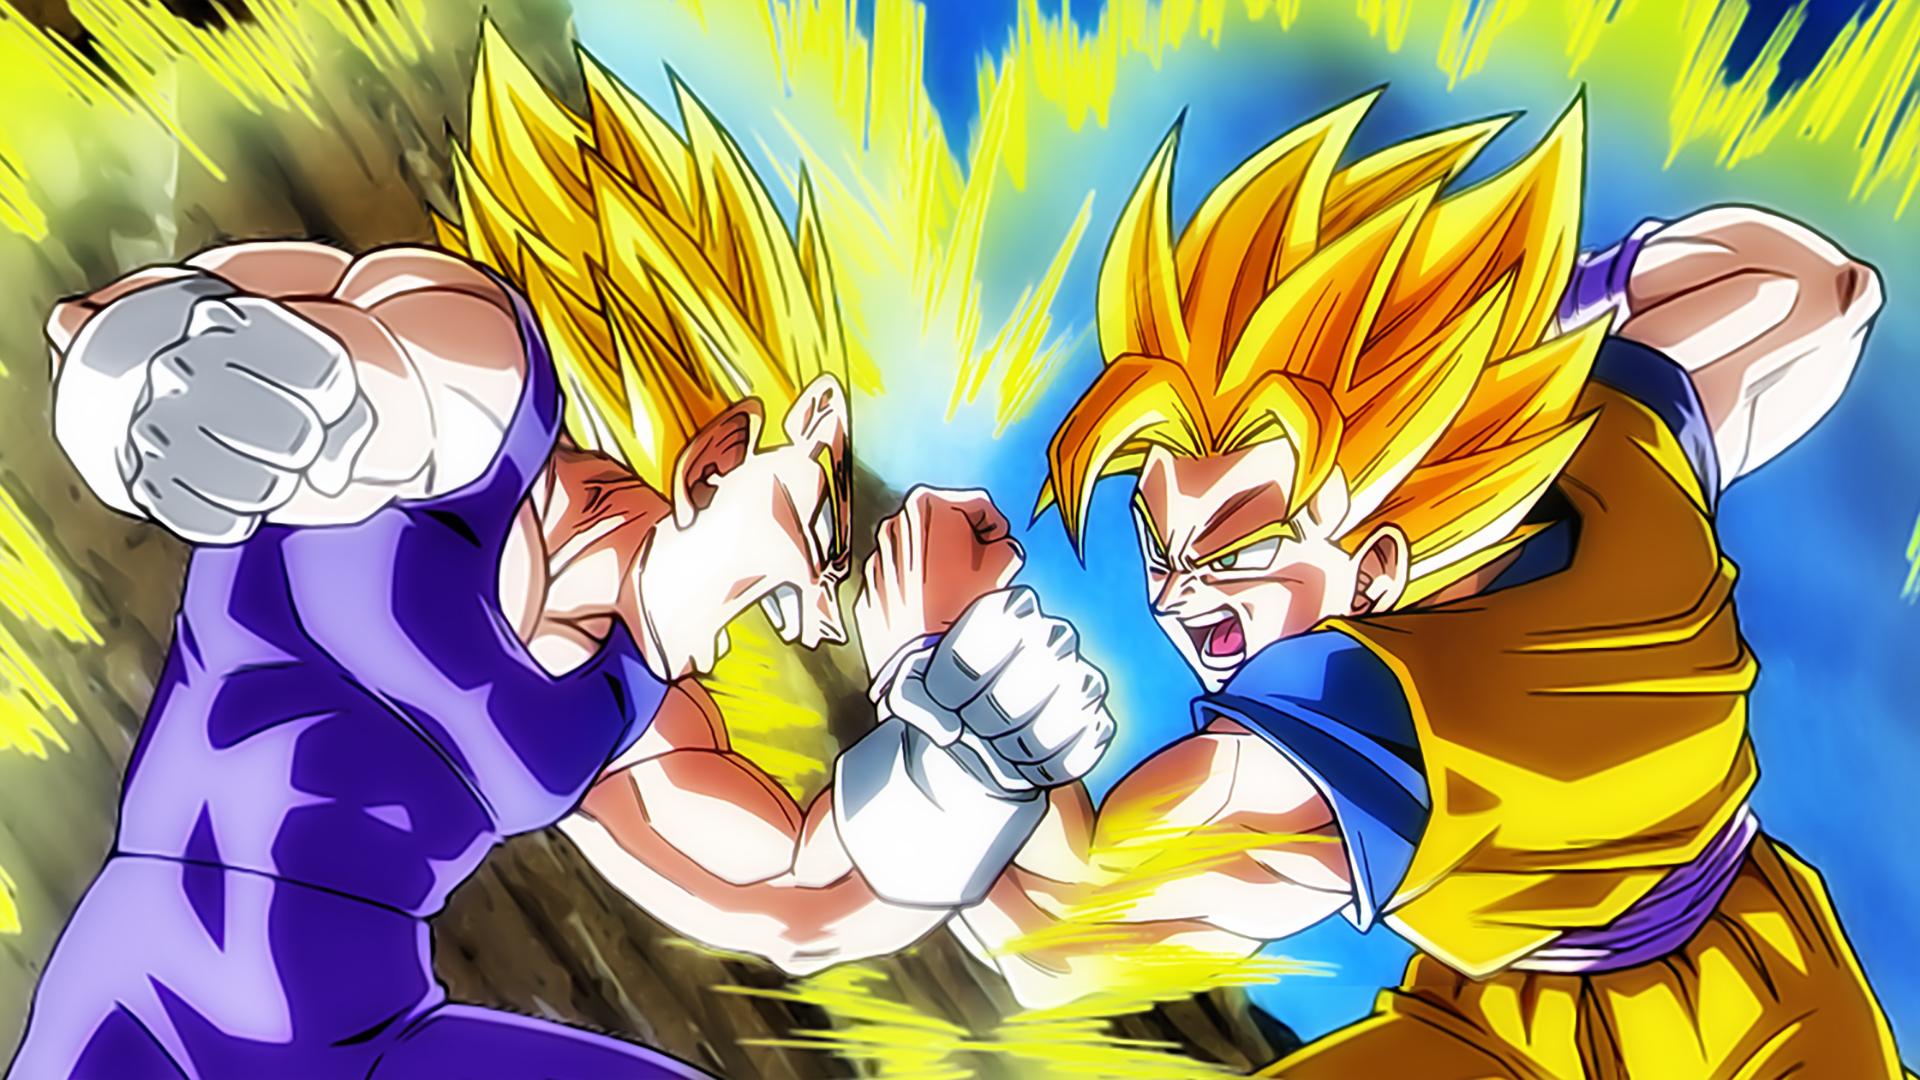 56333 Dragon Ball Z Goku Super Saiyan Vs Vegeta